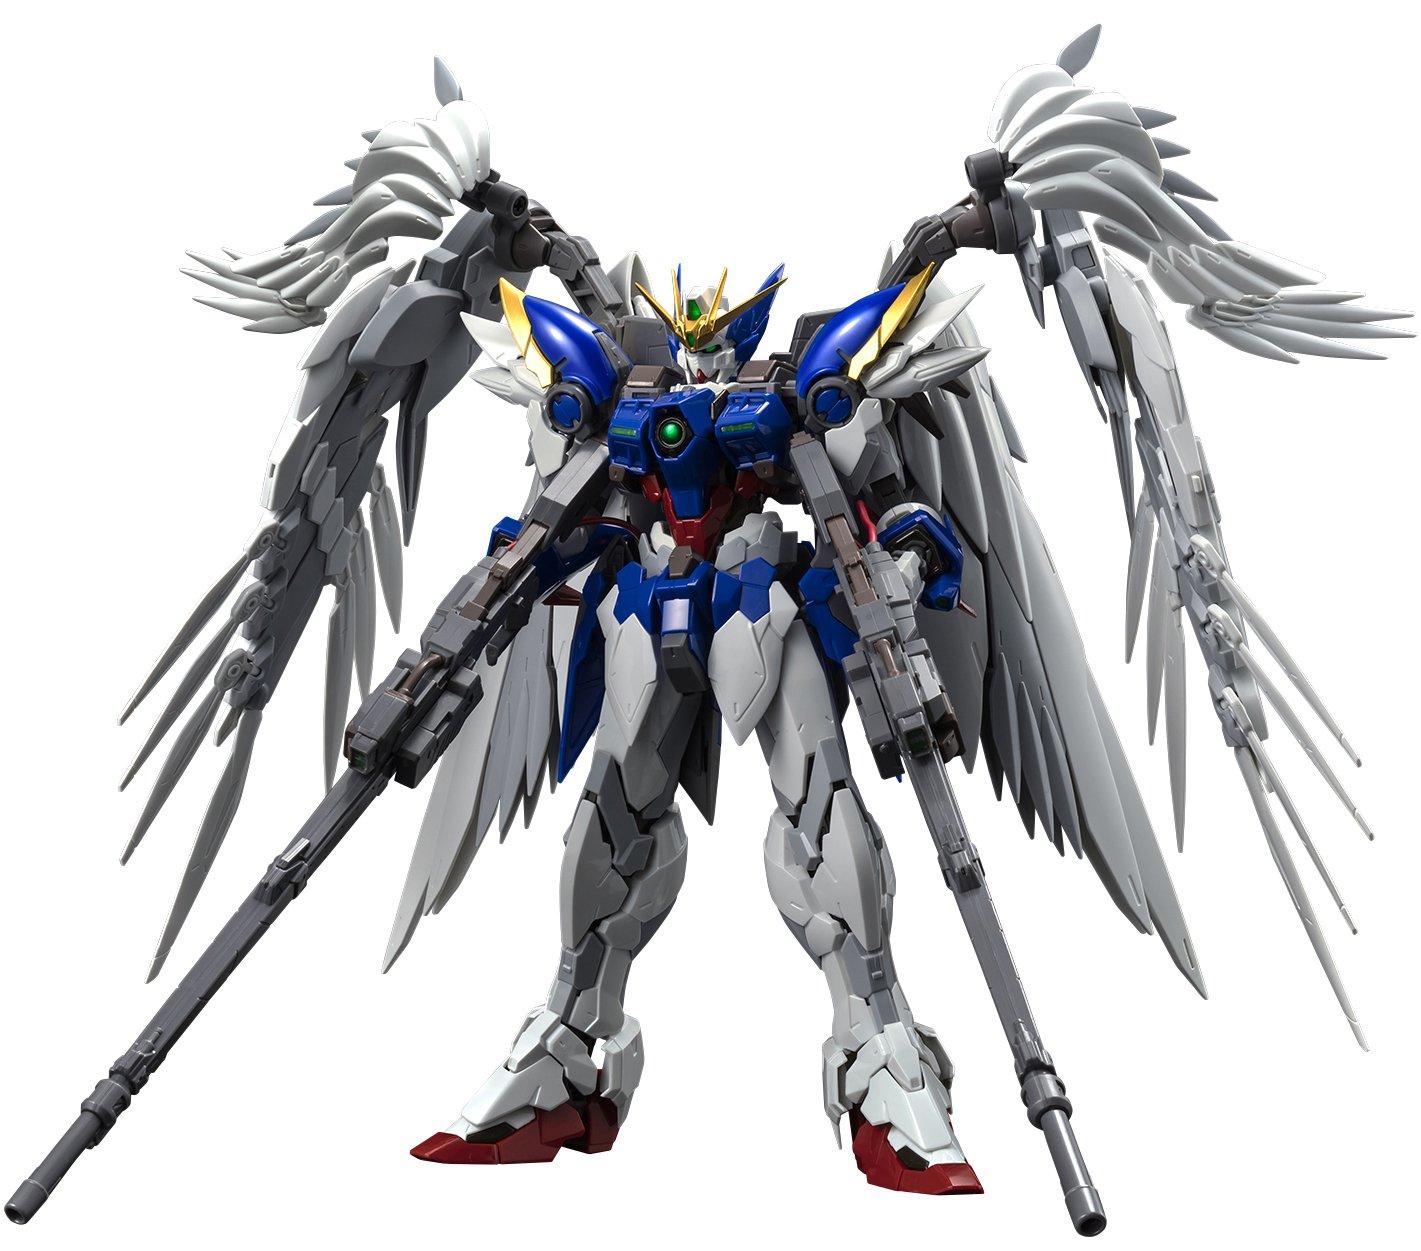 Bandai Hobby hochauflösenden Modell 1/100 Zero EW Gundam Wing ...